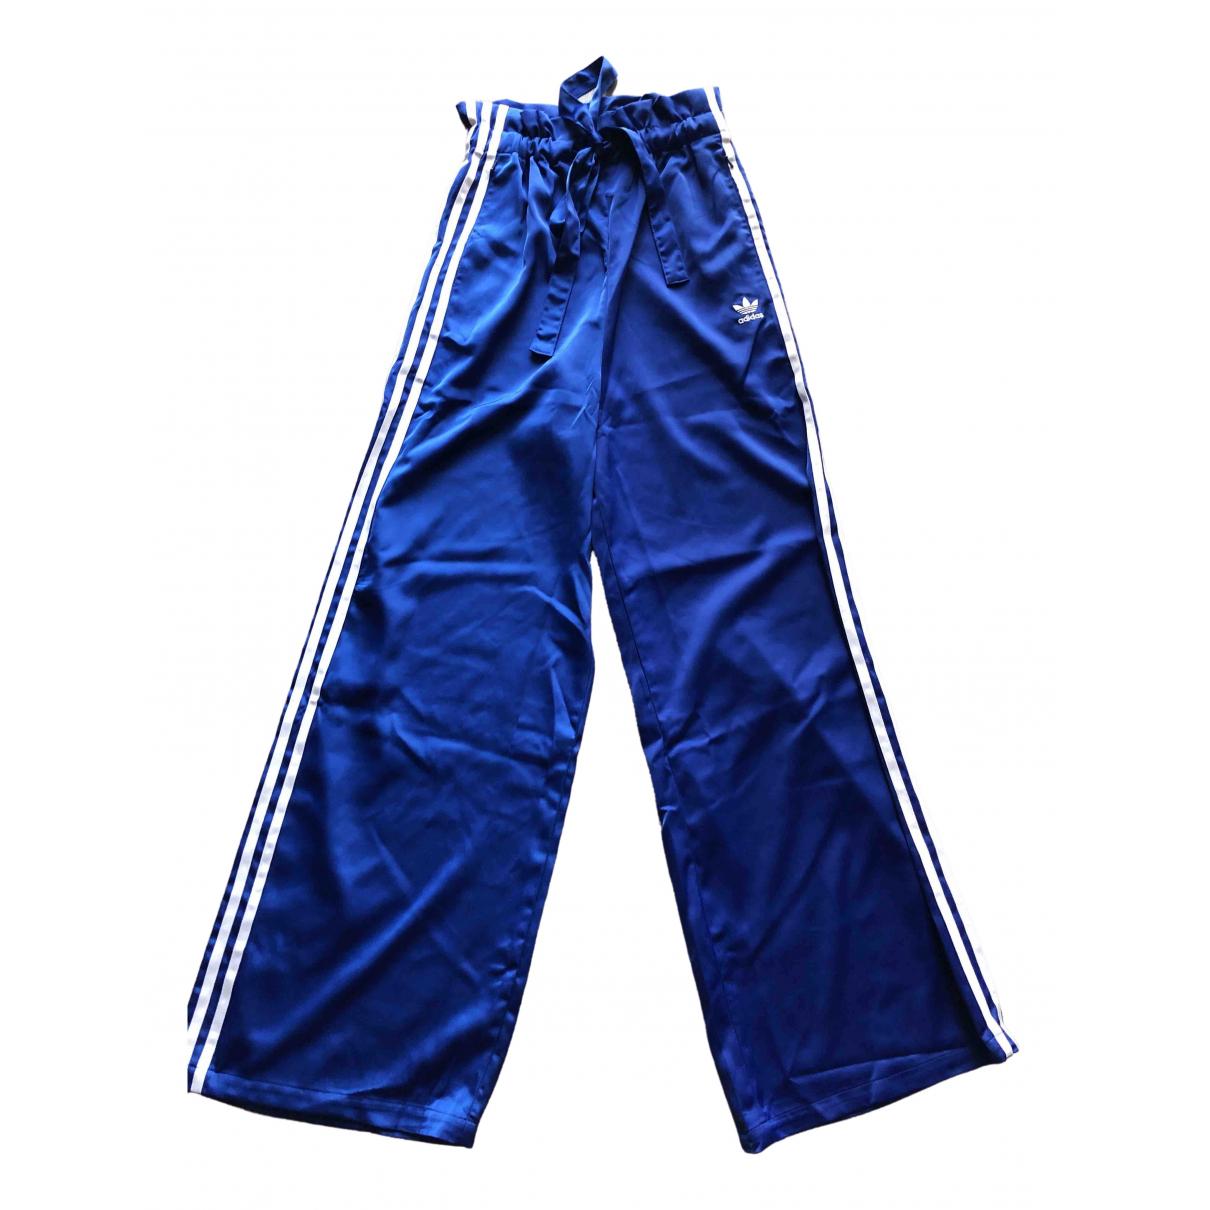 Adidas - Pantalon   pour femme - bleu